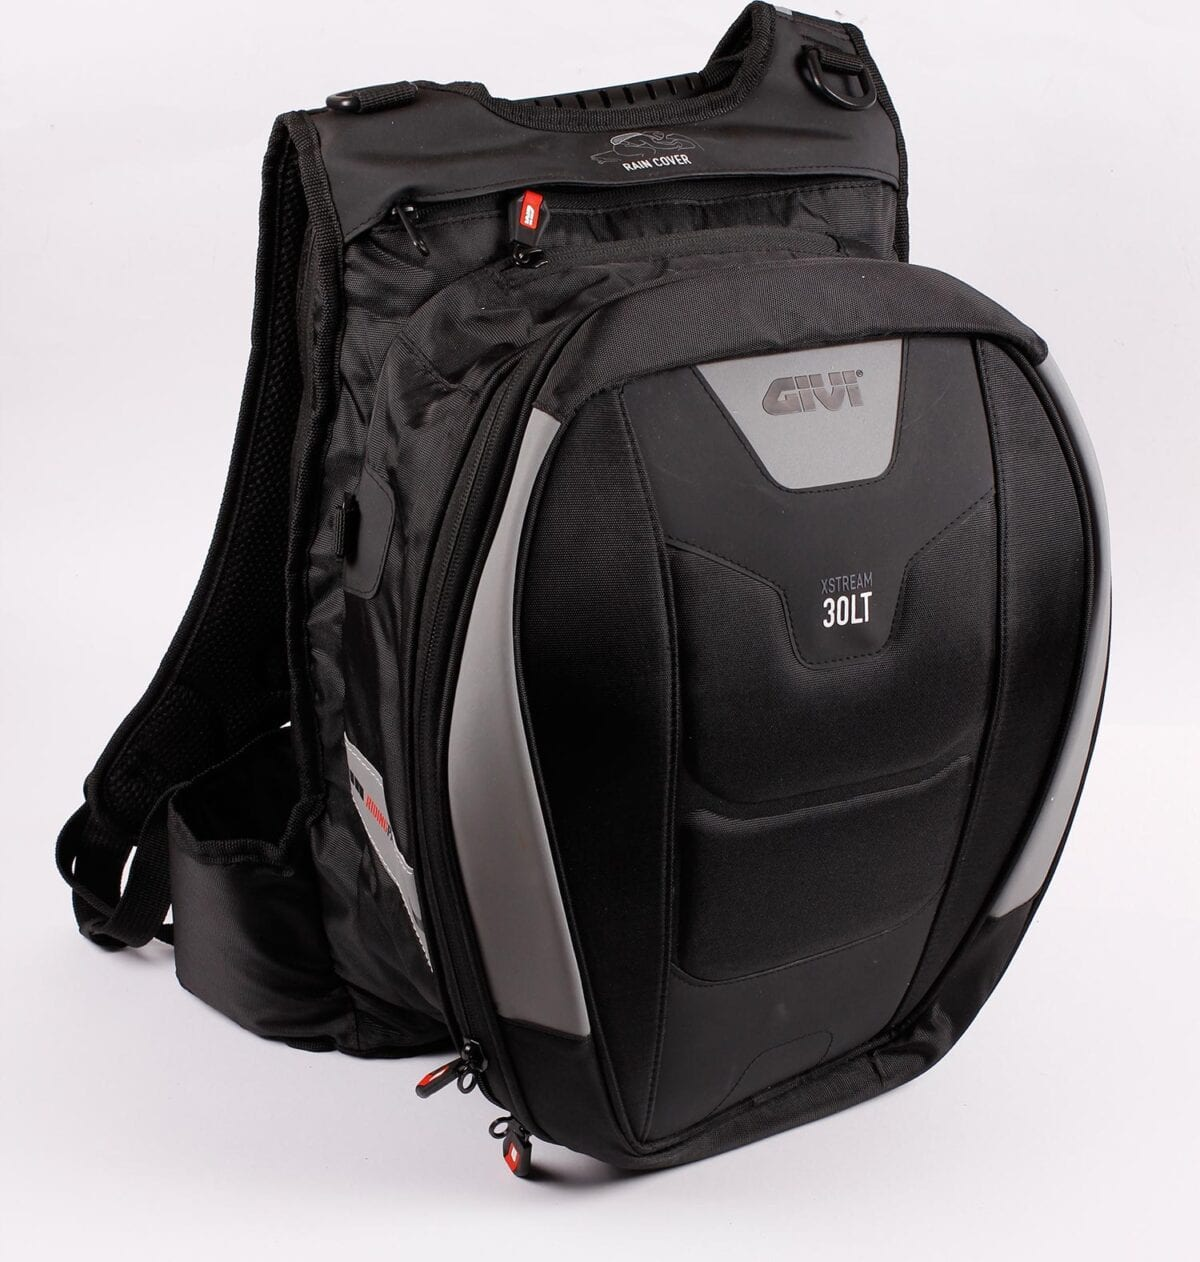 102_Bag-Detail-6